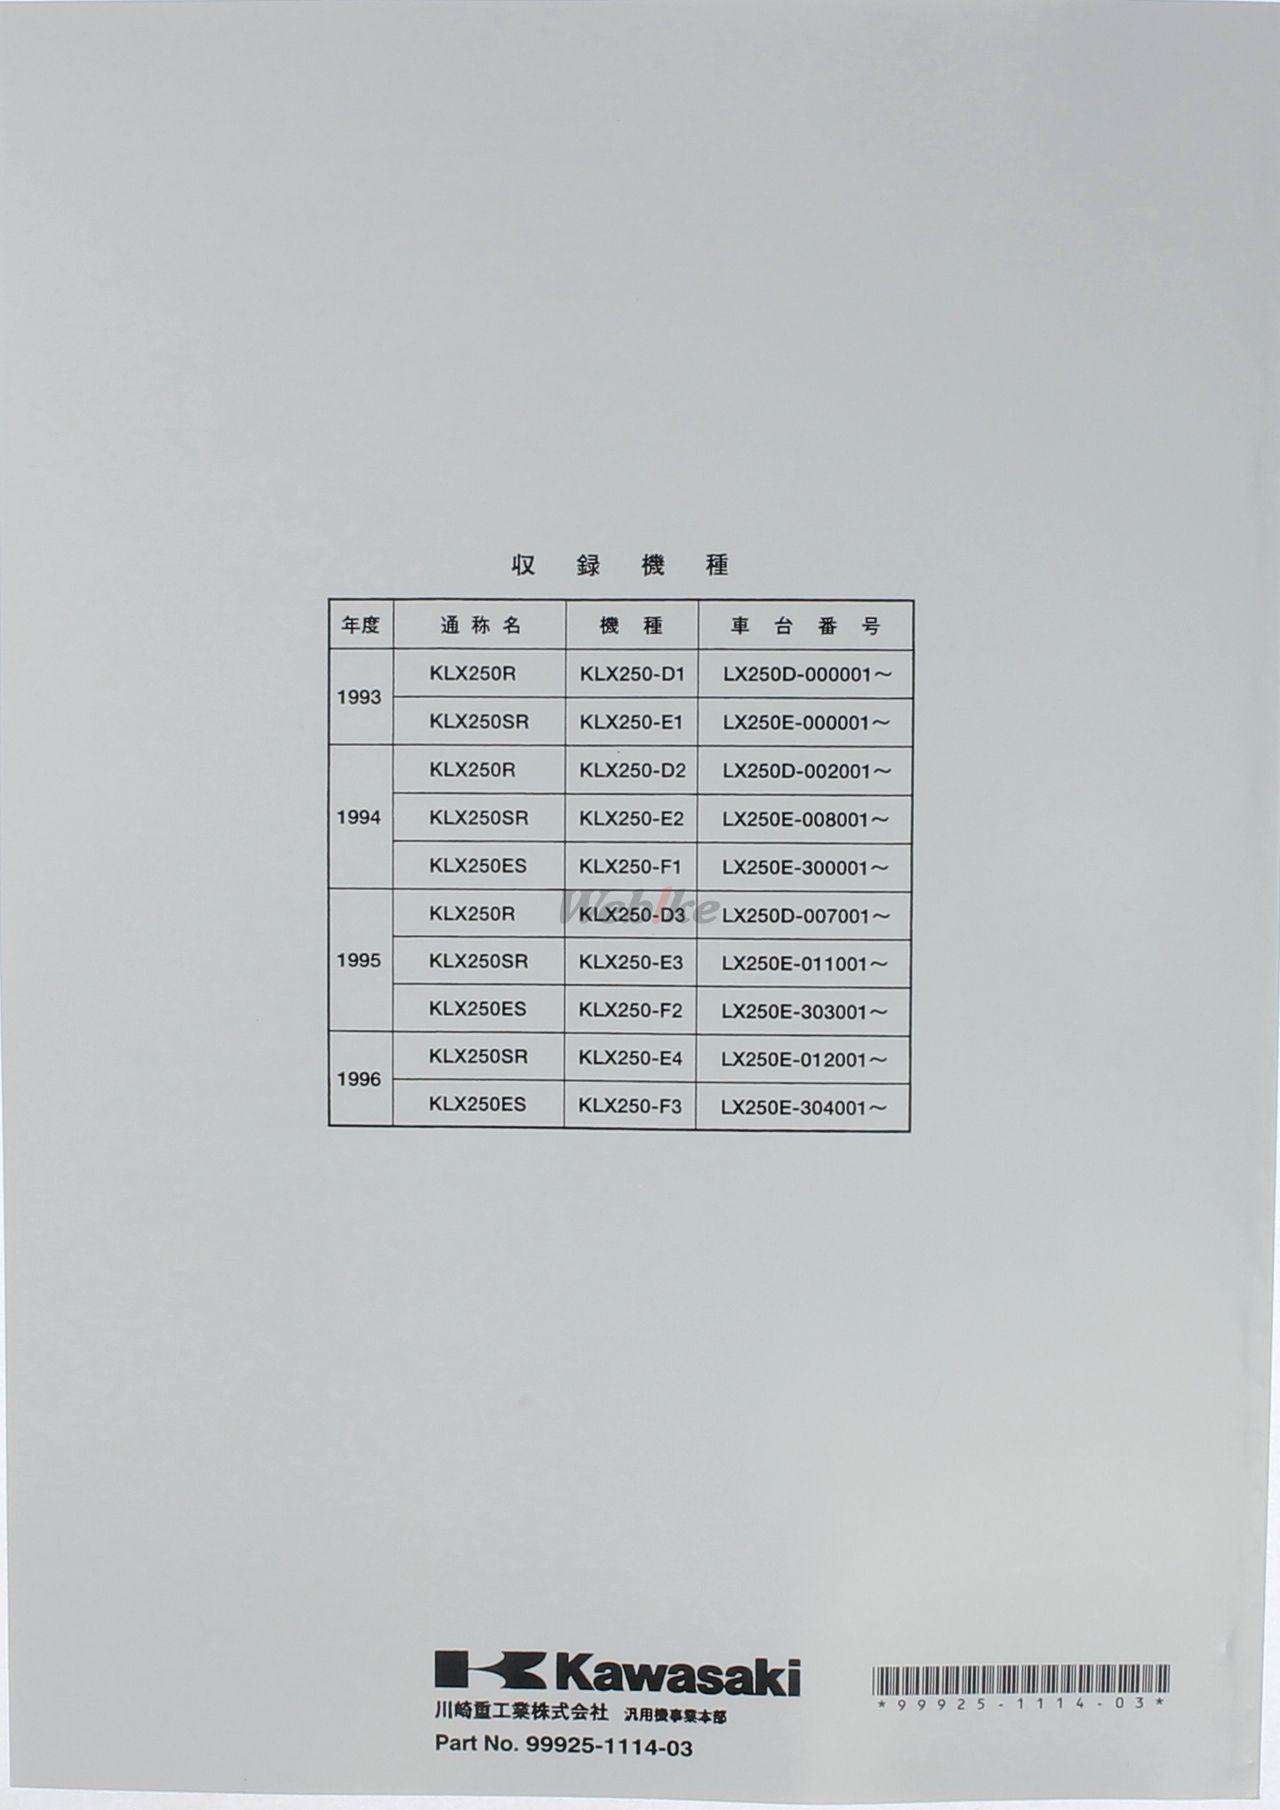 【KAWASAKI】KLX250SR/ES/KLX250R (競技用)/D-TRACKER/KLX250 維修手冊(基本版) - 「Webike-摩托百貨」